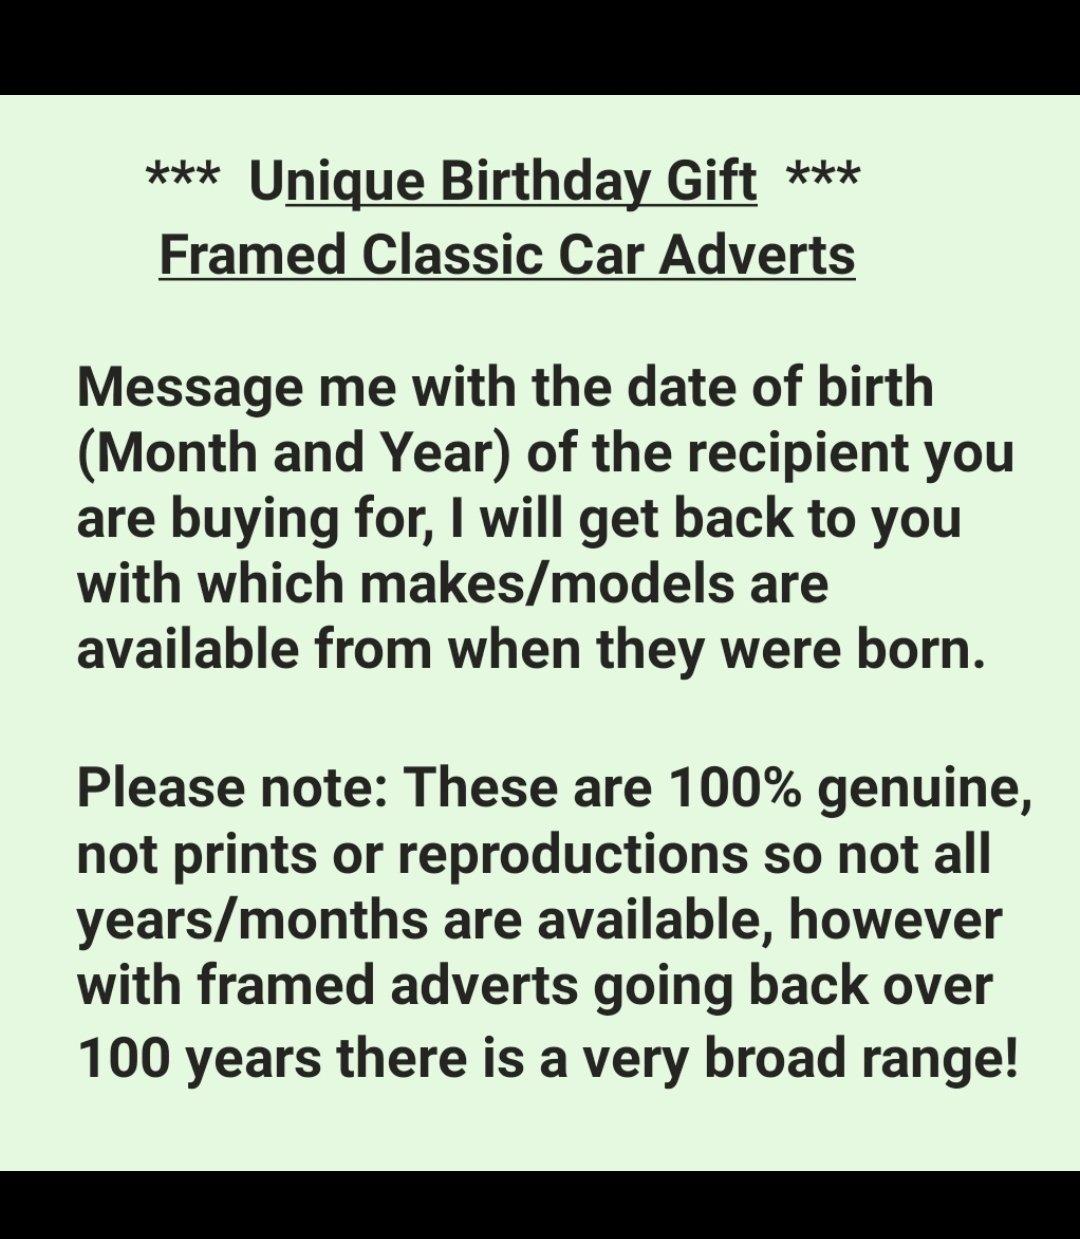 1970 Original 1930 Mercedes-Benz Framed Advert For Sale (picture 3 of 3)